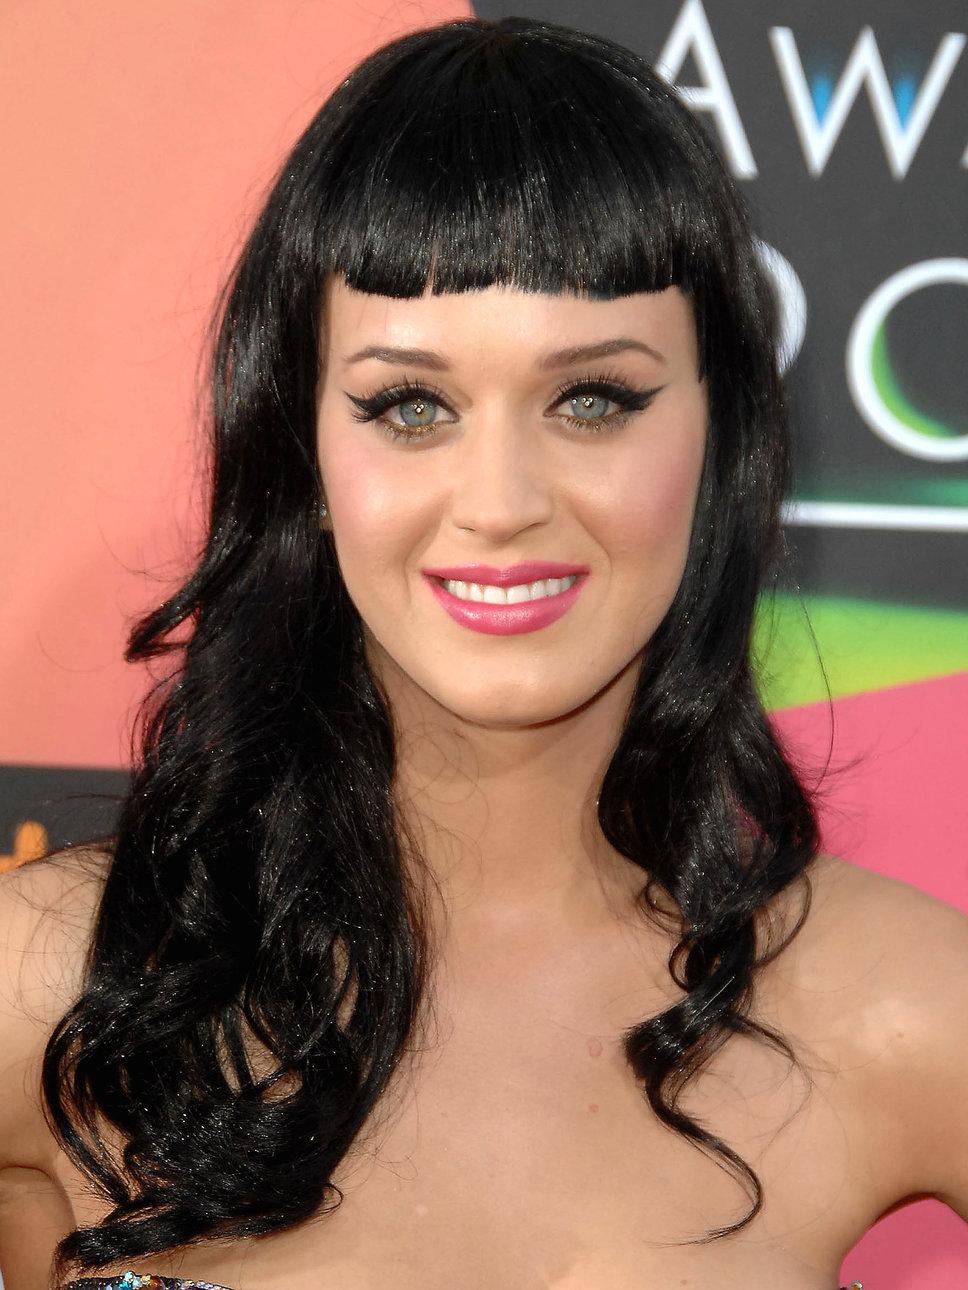 Katy Perry Katy Perry Face